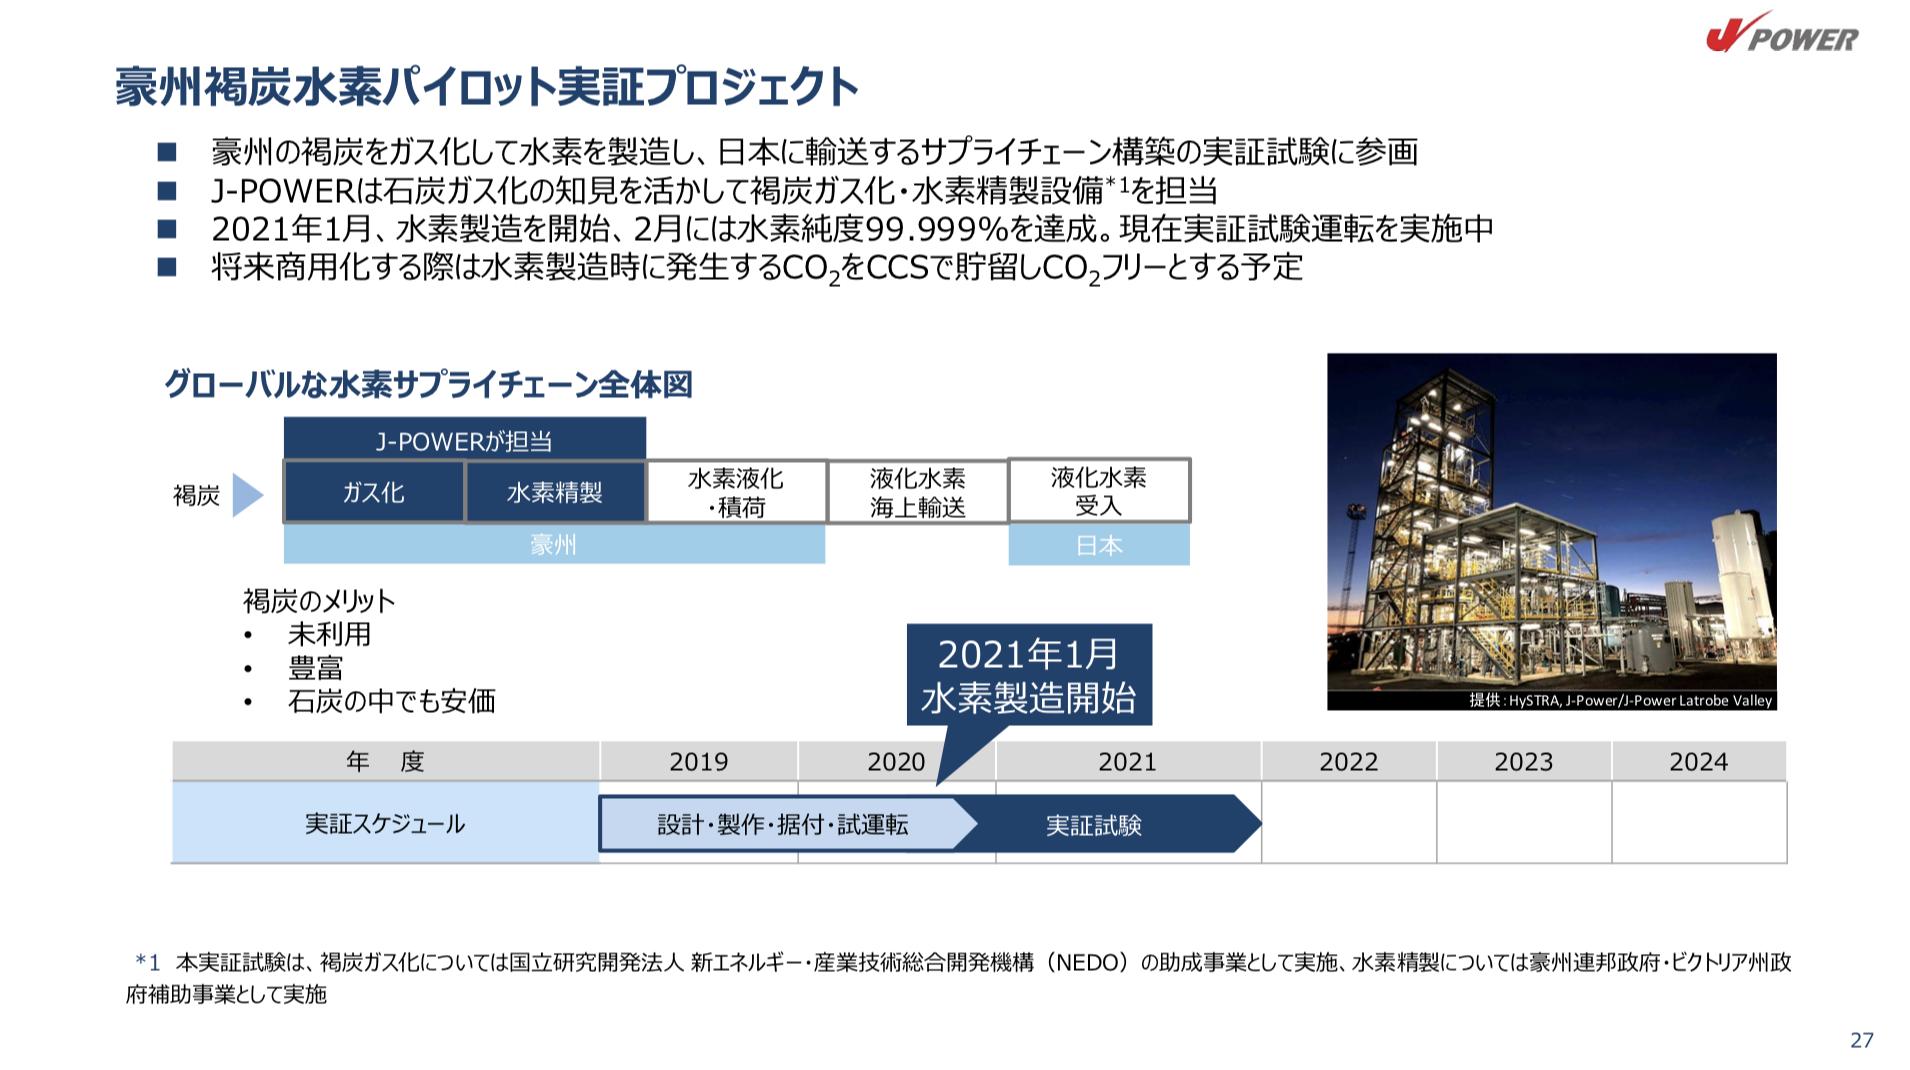 電源開発株式会社(J-POWER) 2021年度1Q決算を徹底解説! さとり世代の株日記 資産運用 株 投資 資産形成 株式投資